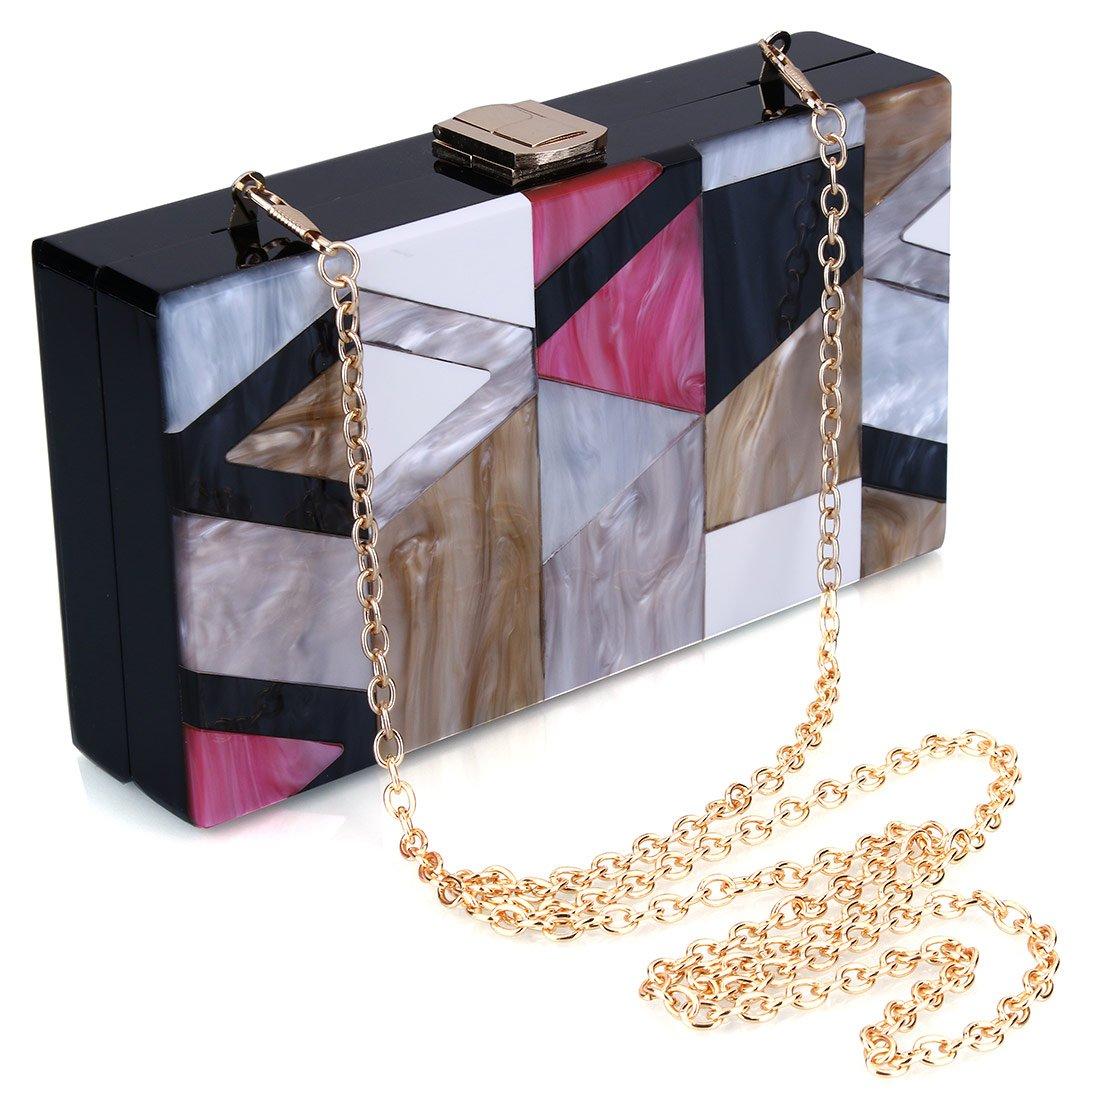 EROGE Acrylic Clutch Purse Perspex Box Colorful Geometric Design Handbags for Women (Geometric)